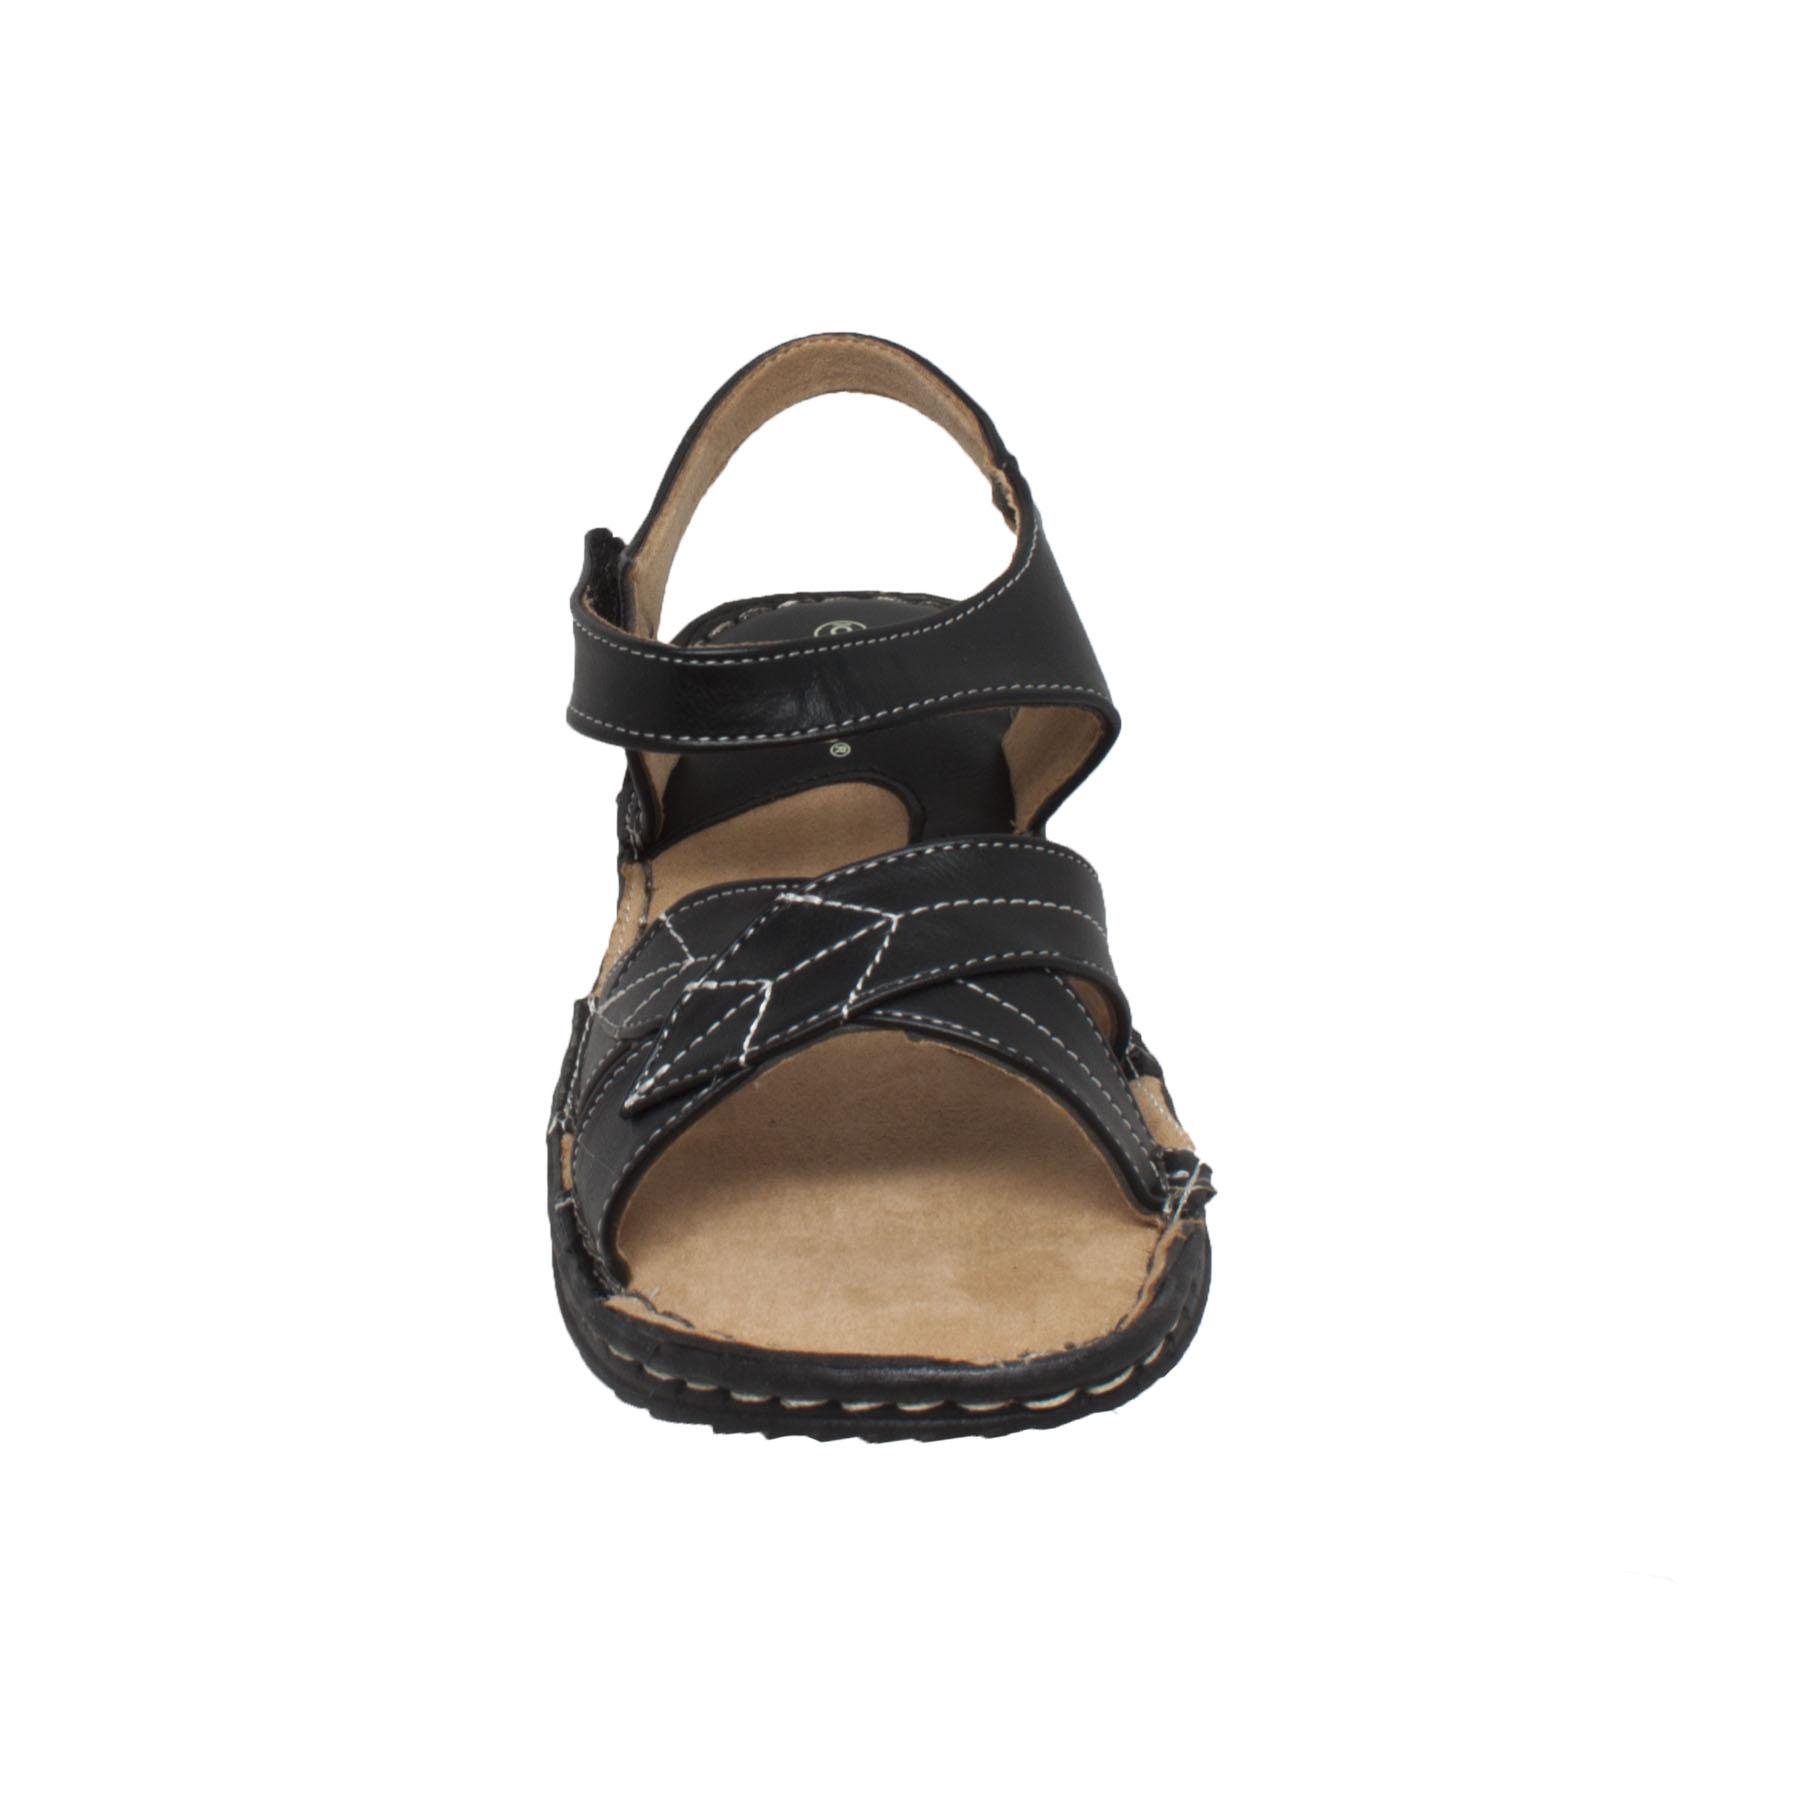 Comfort Sandal with Ankle Strap Black